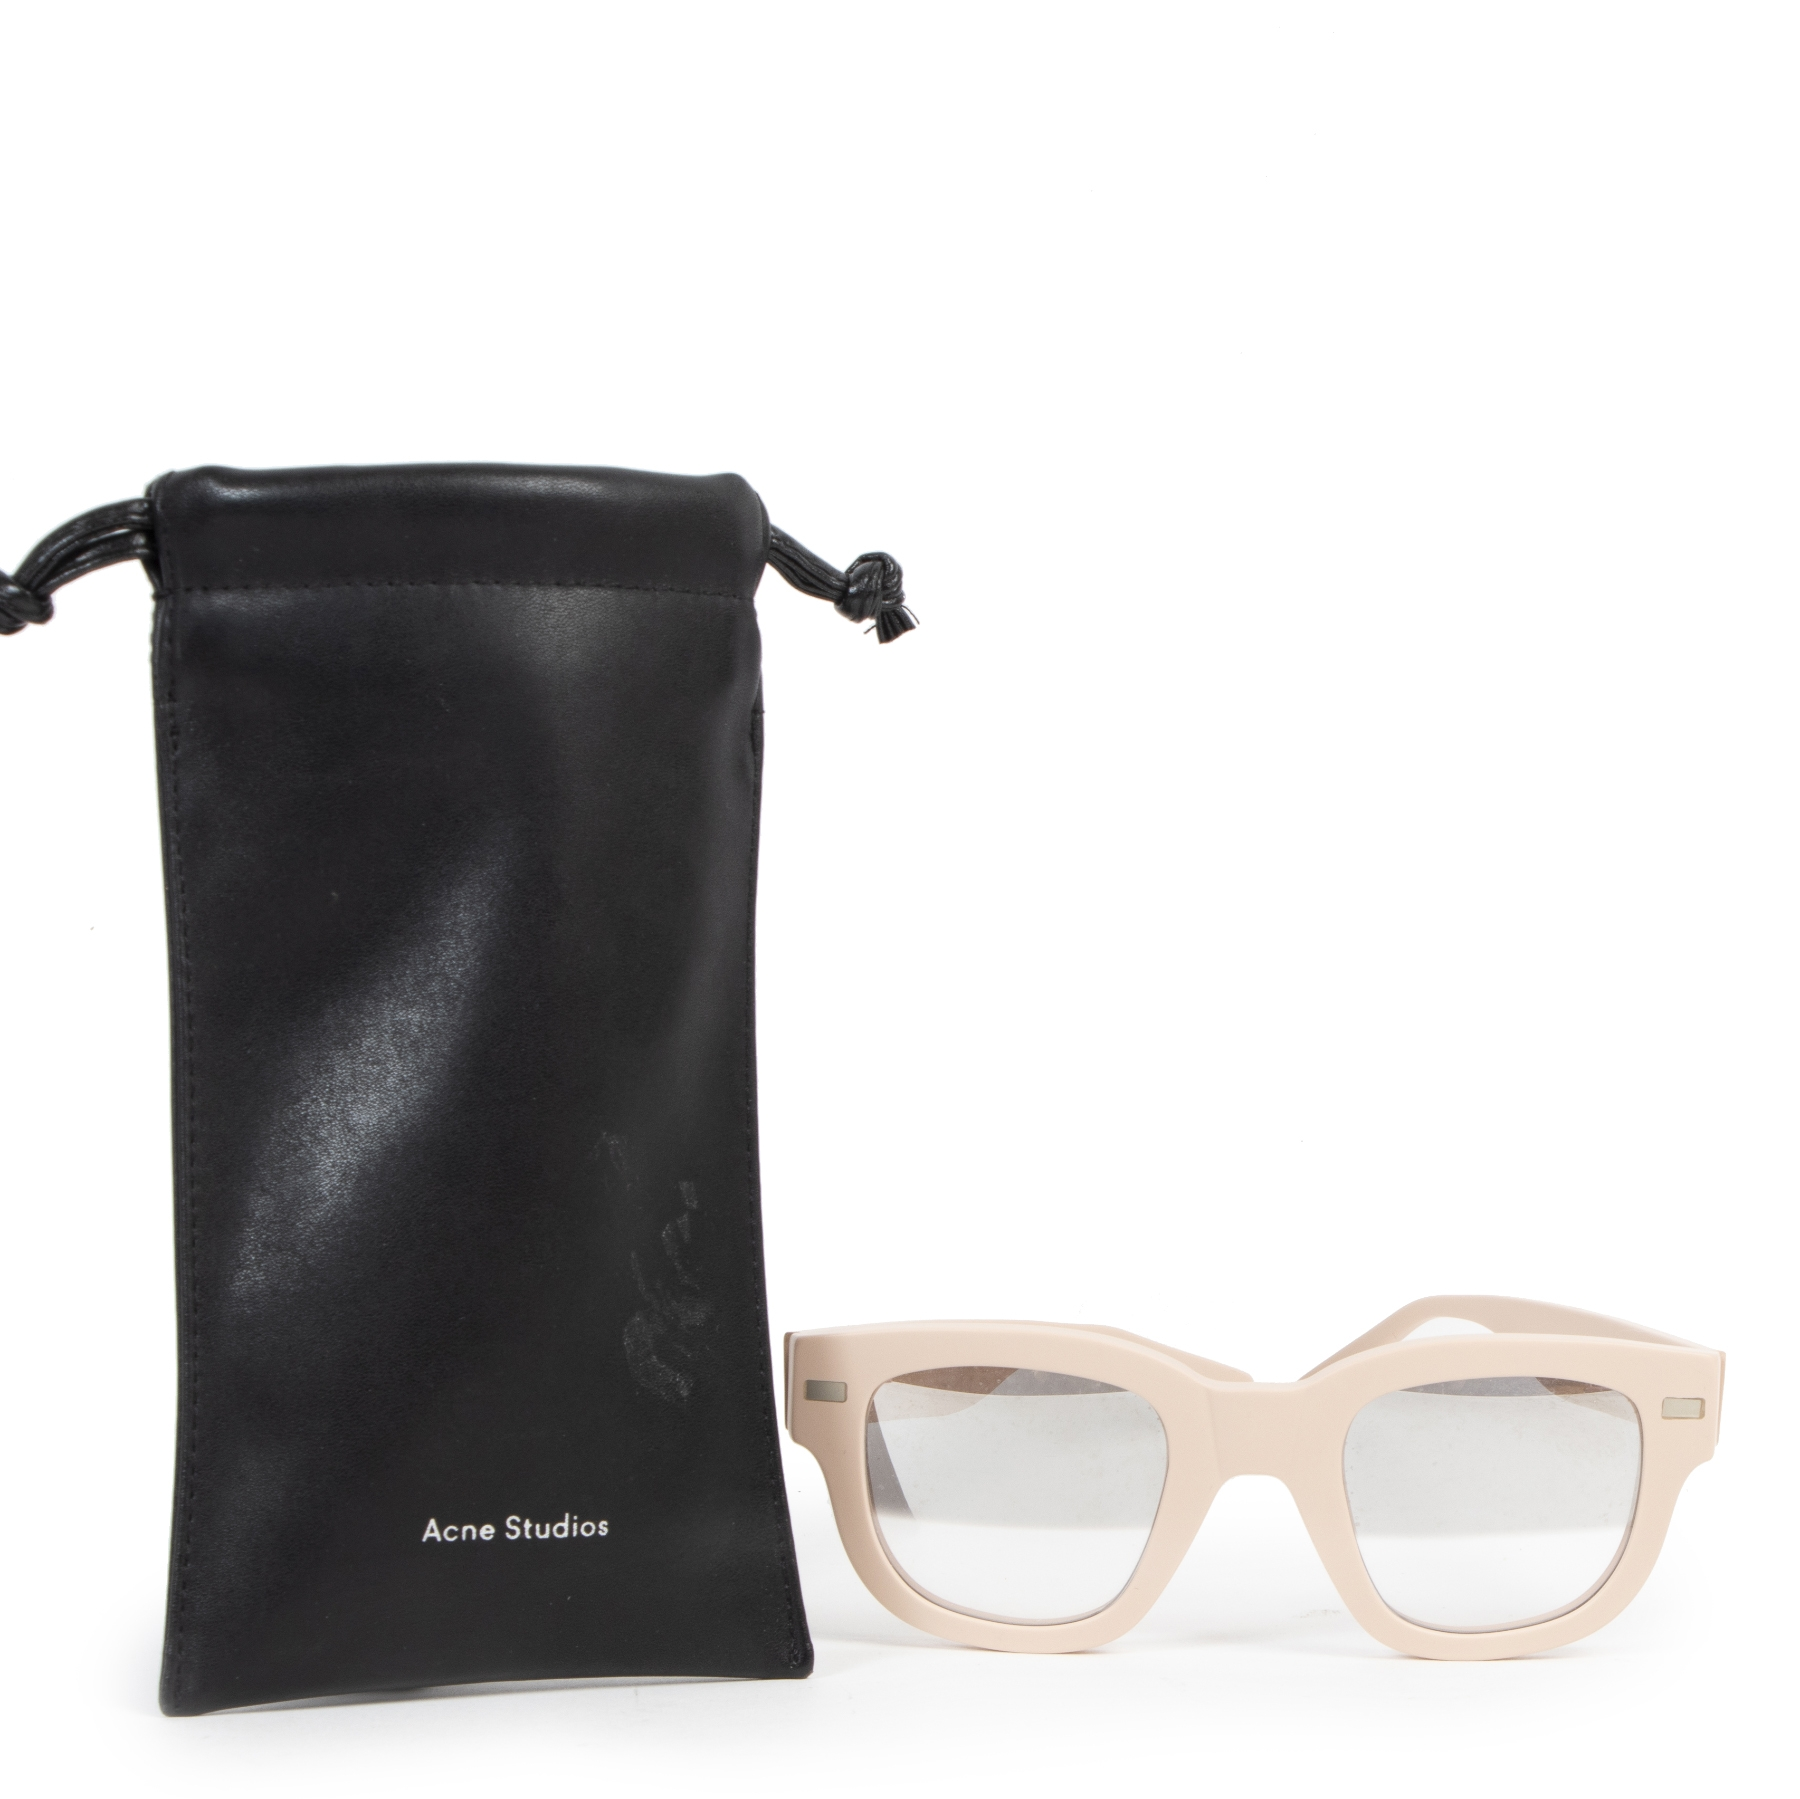 Buy online preloved secondhand sunglasses luxury Acne Studios at LabelLOV Antwerp